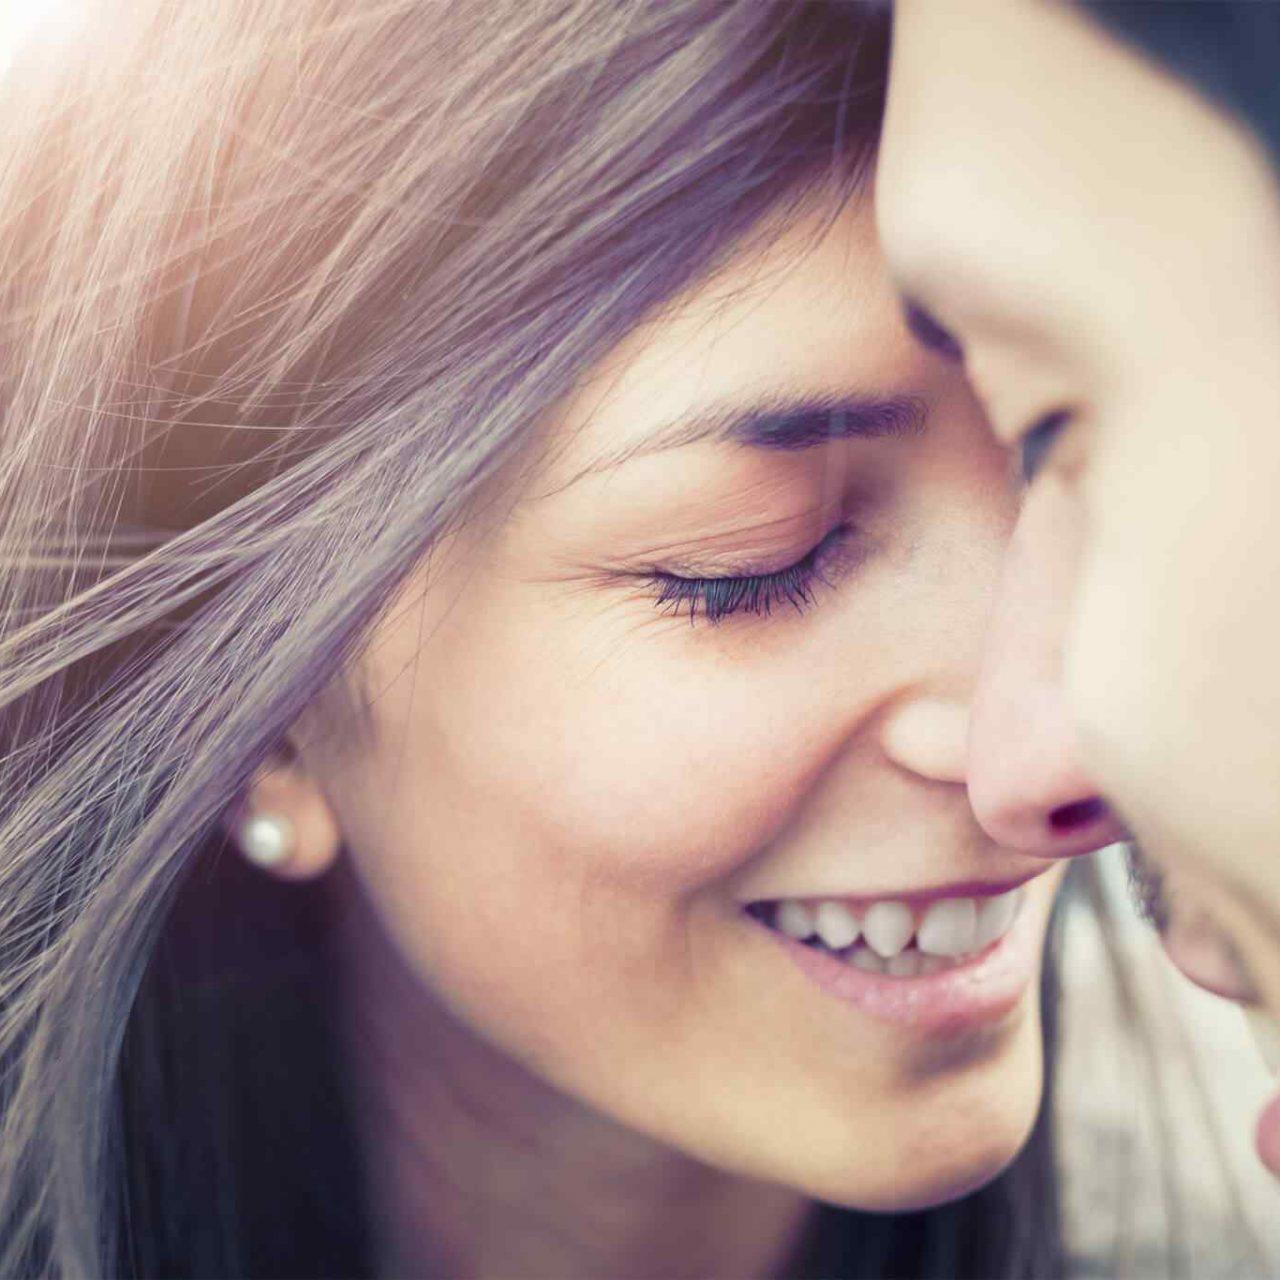 https://allabout-culture.com/wp-content/uploads/2018/01/img-class-marriage-01-1280x1280.jpg